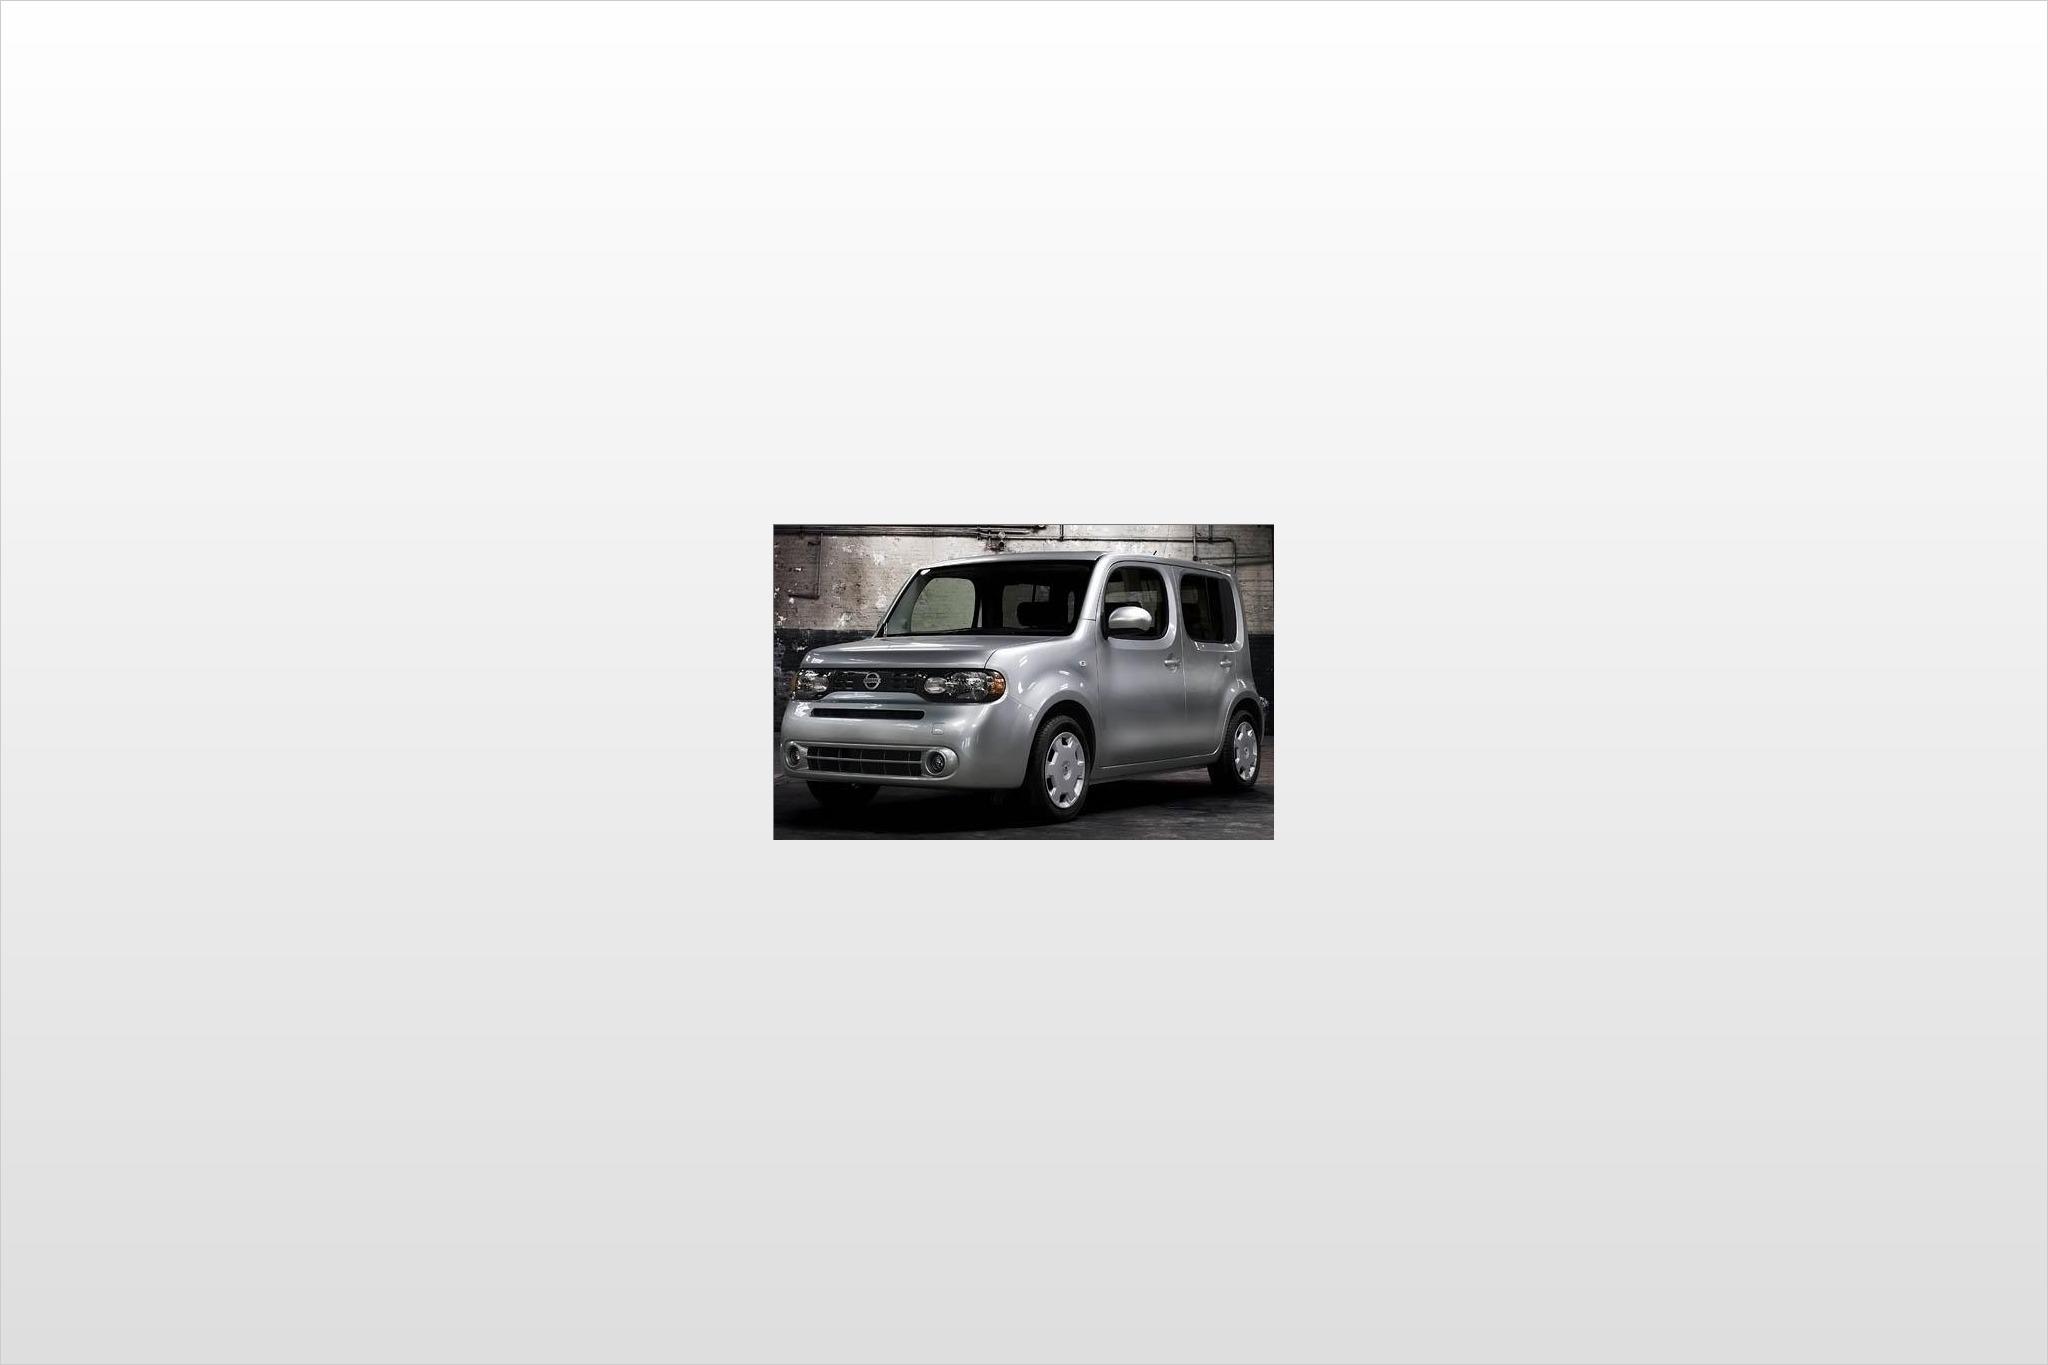 2009 nissan cube wagon 18 sl fq oem 1 2048